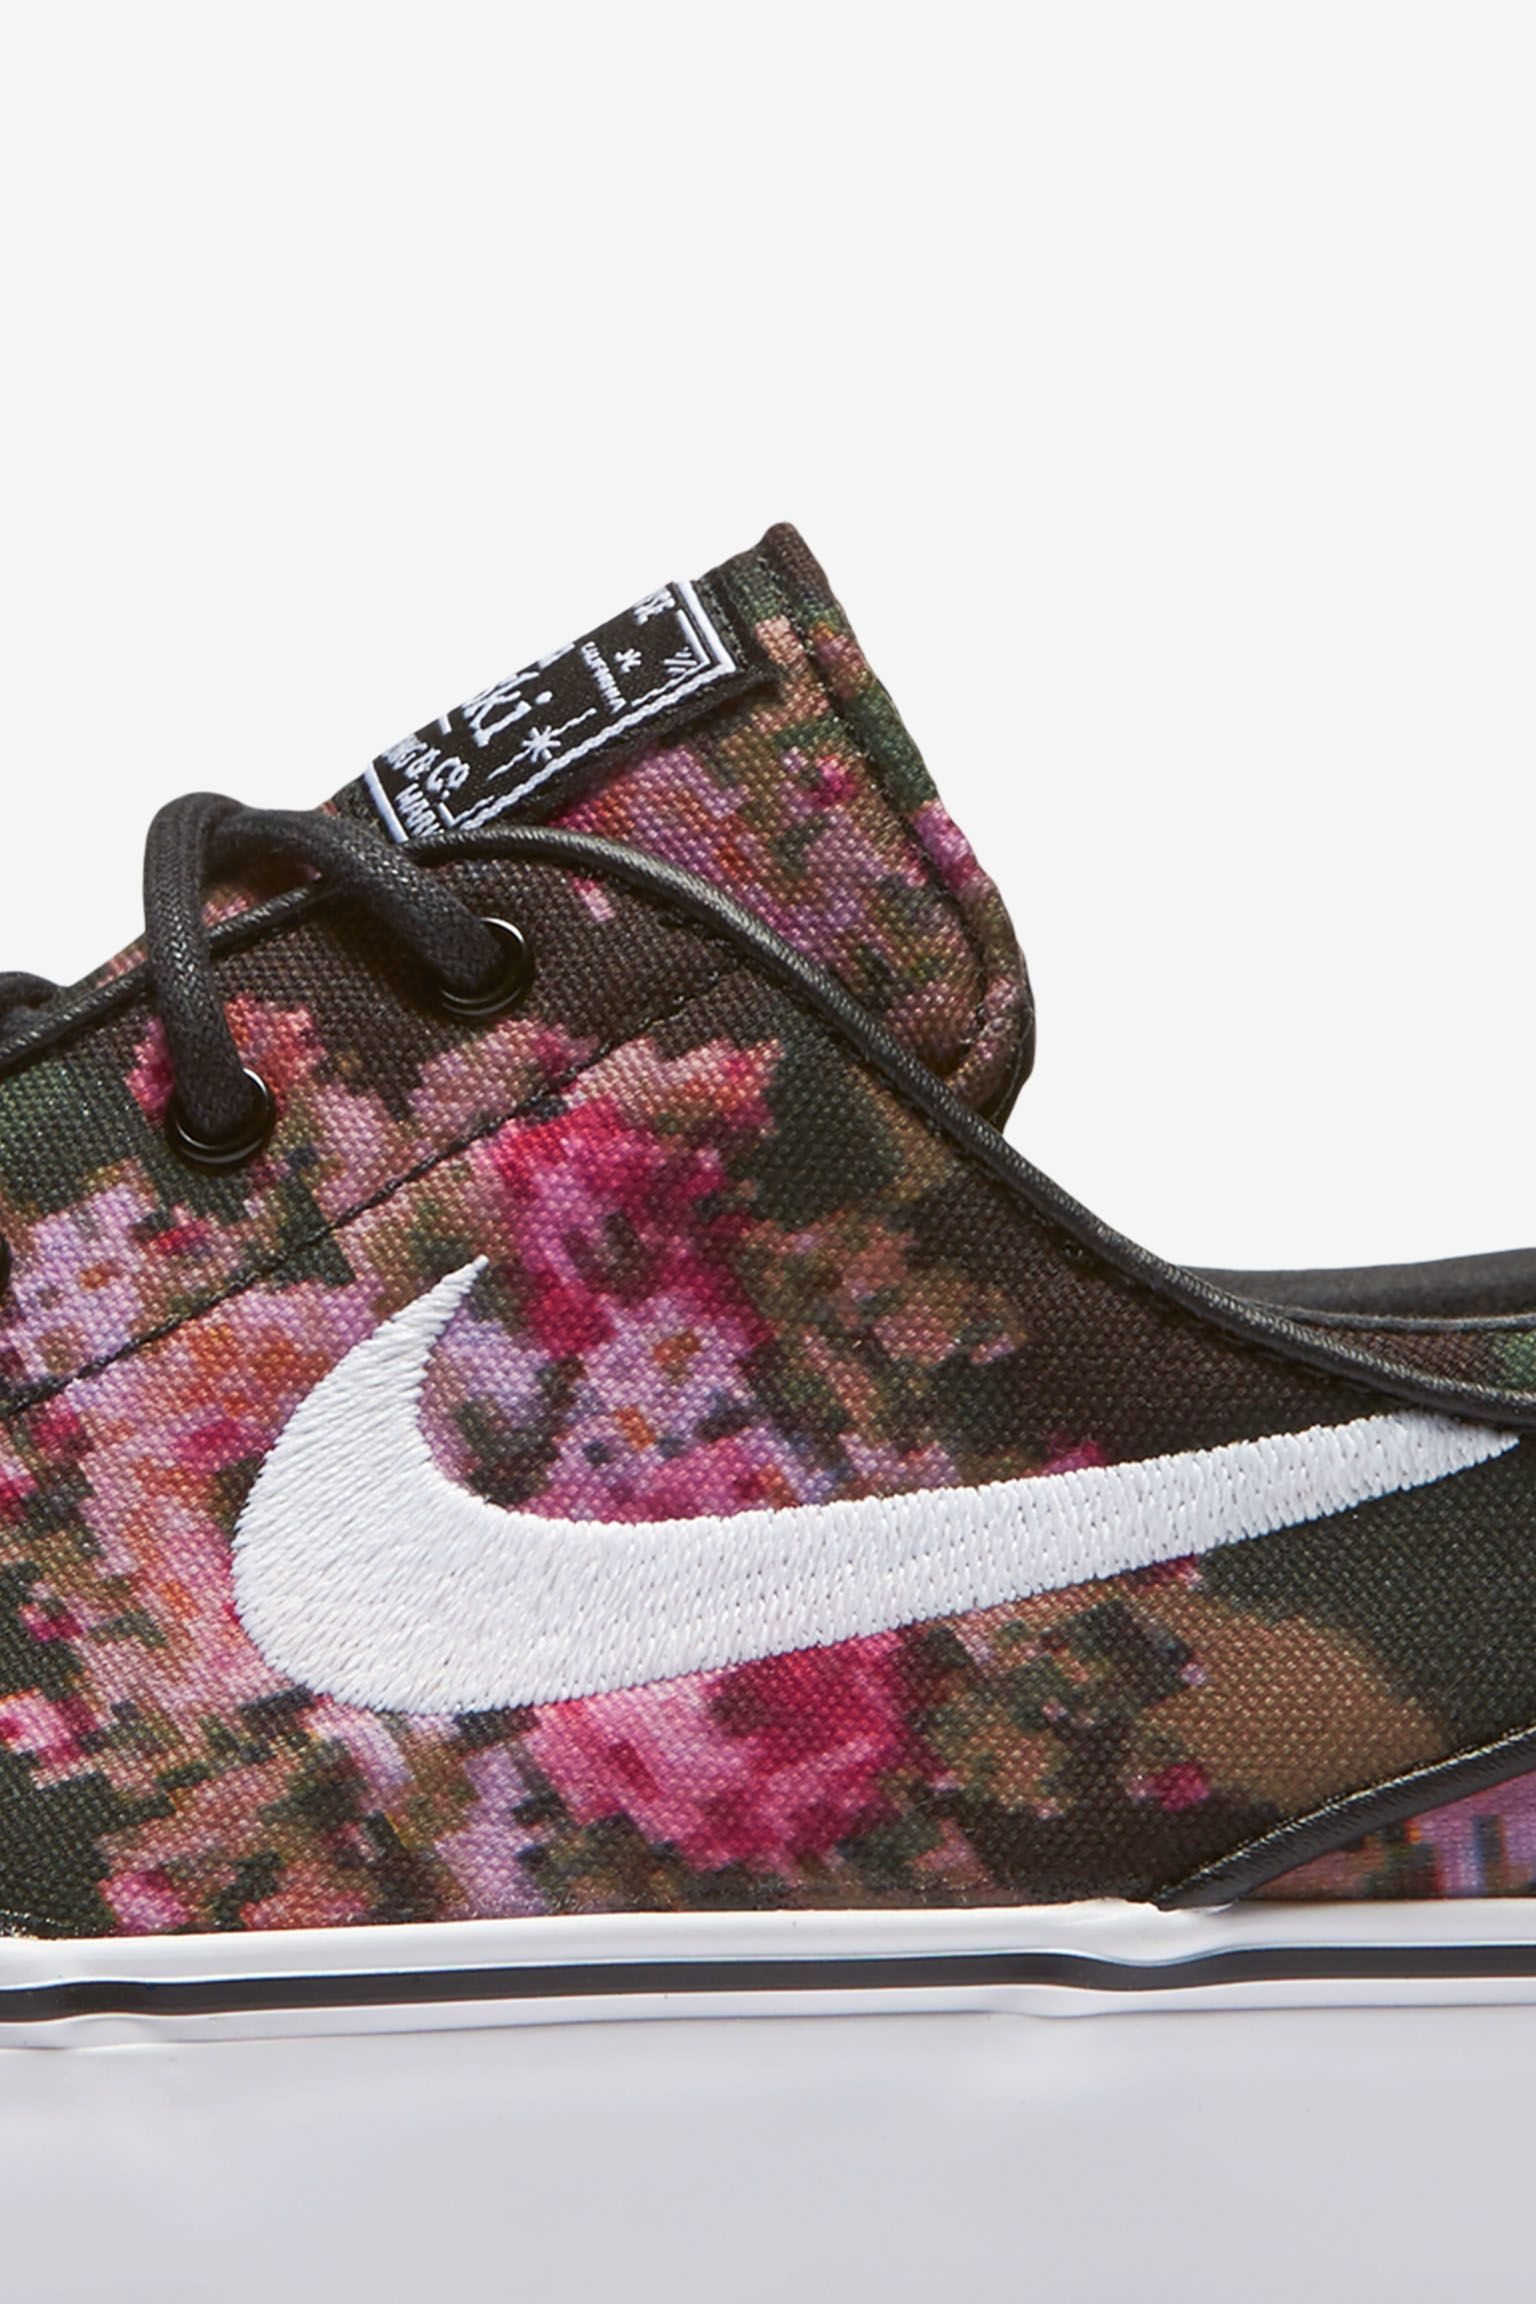 Nike Zoom Stefan Janoski 'Digi-Floral'